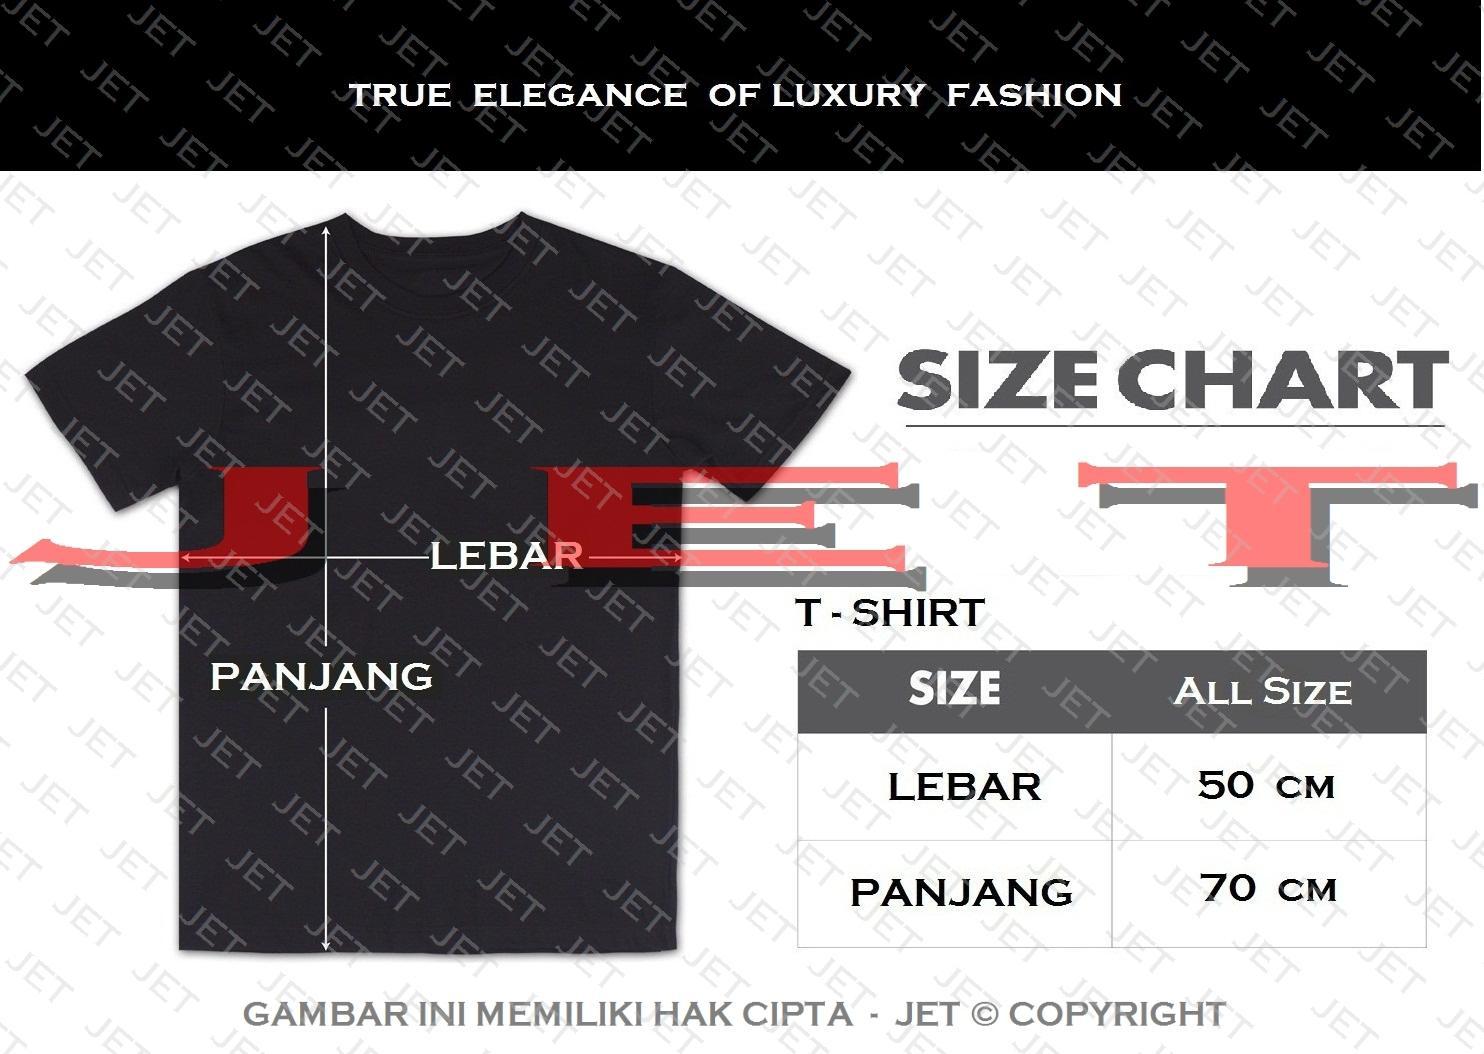 ... JET - VOLKSWAGEN 100% Soft Cotton Combed 30s Kaos Distro Fashion T-Shirt Atasan